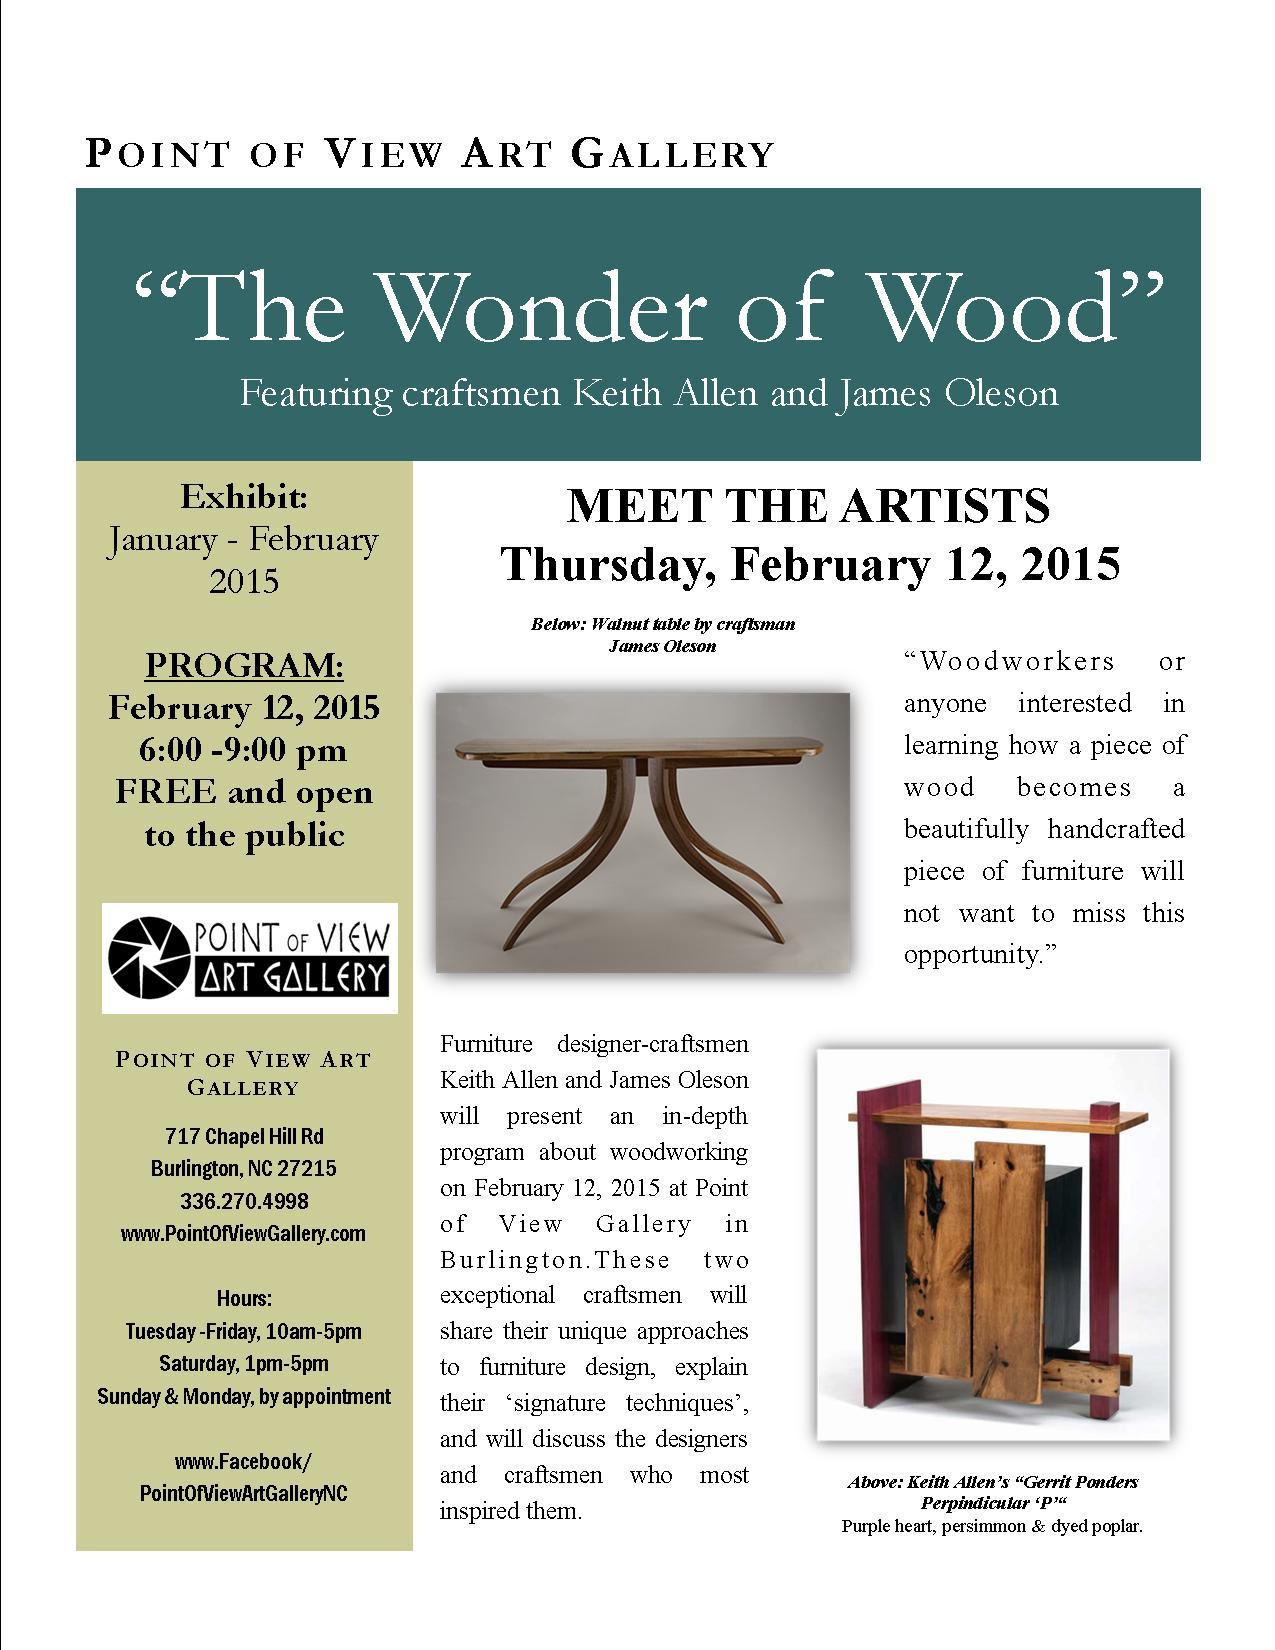 The Wonder of Wood